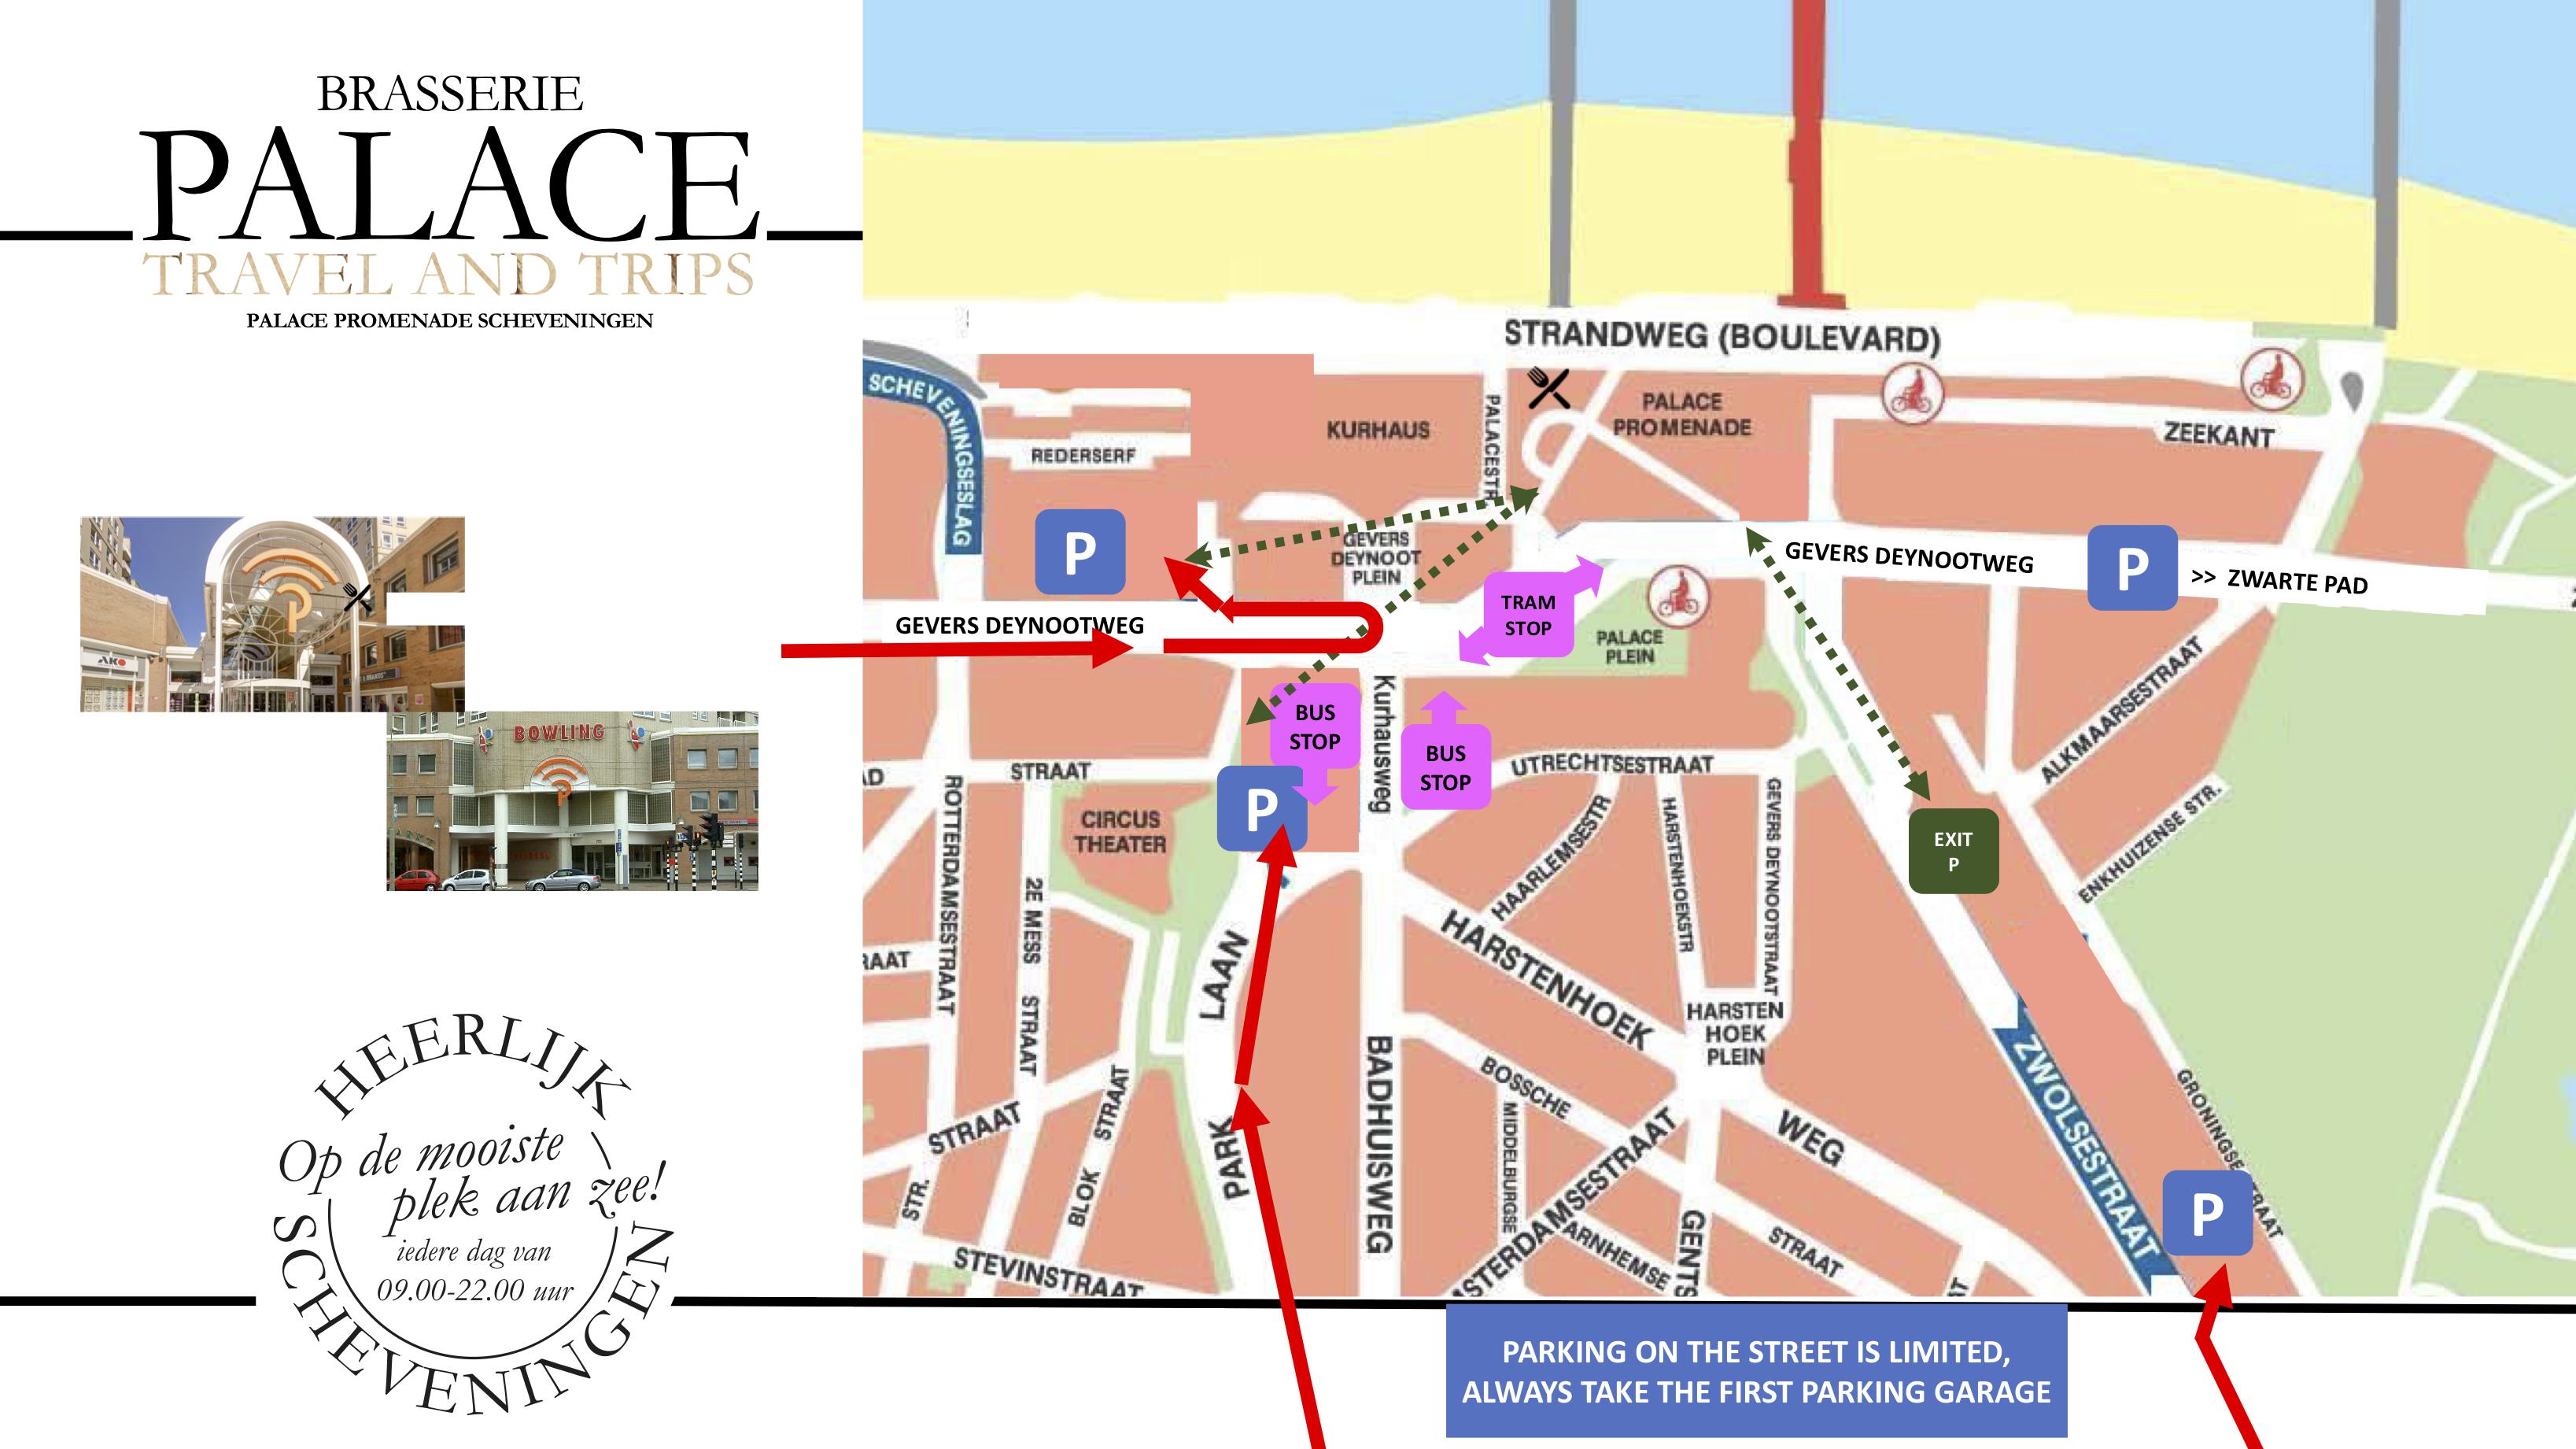 Route naar Brasserie Palace Promenade Scheveningen